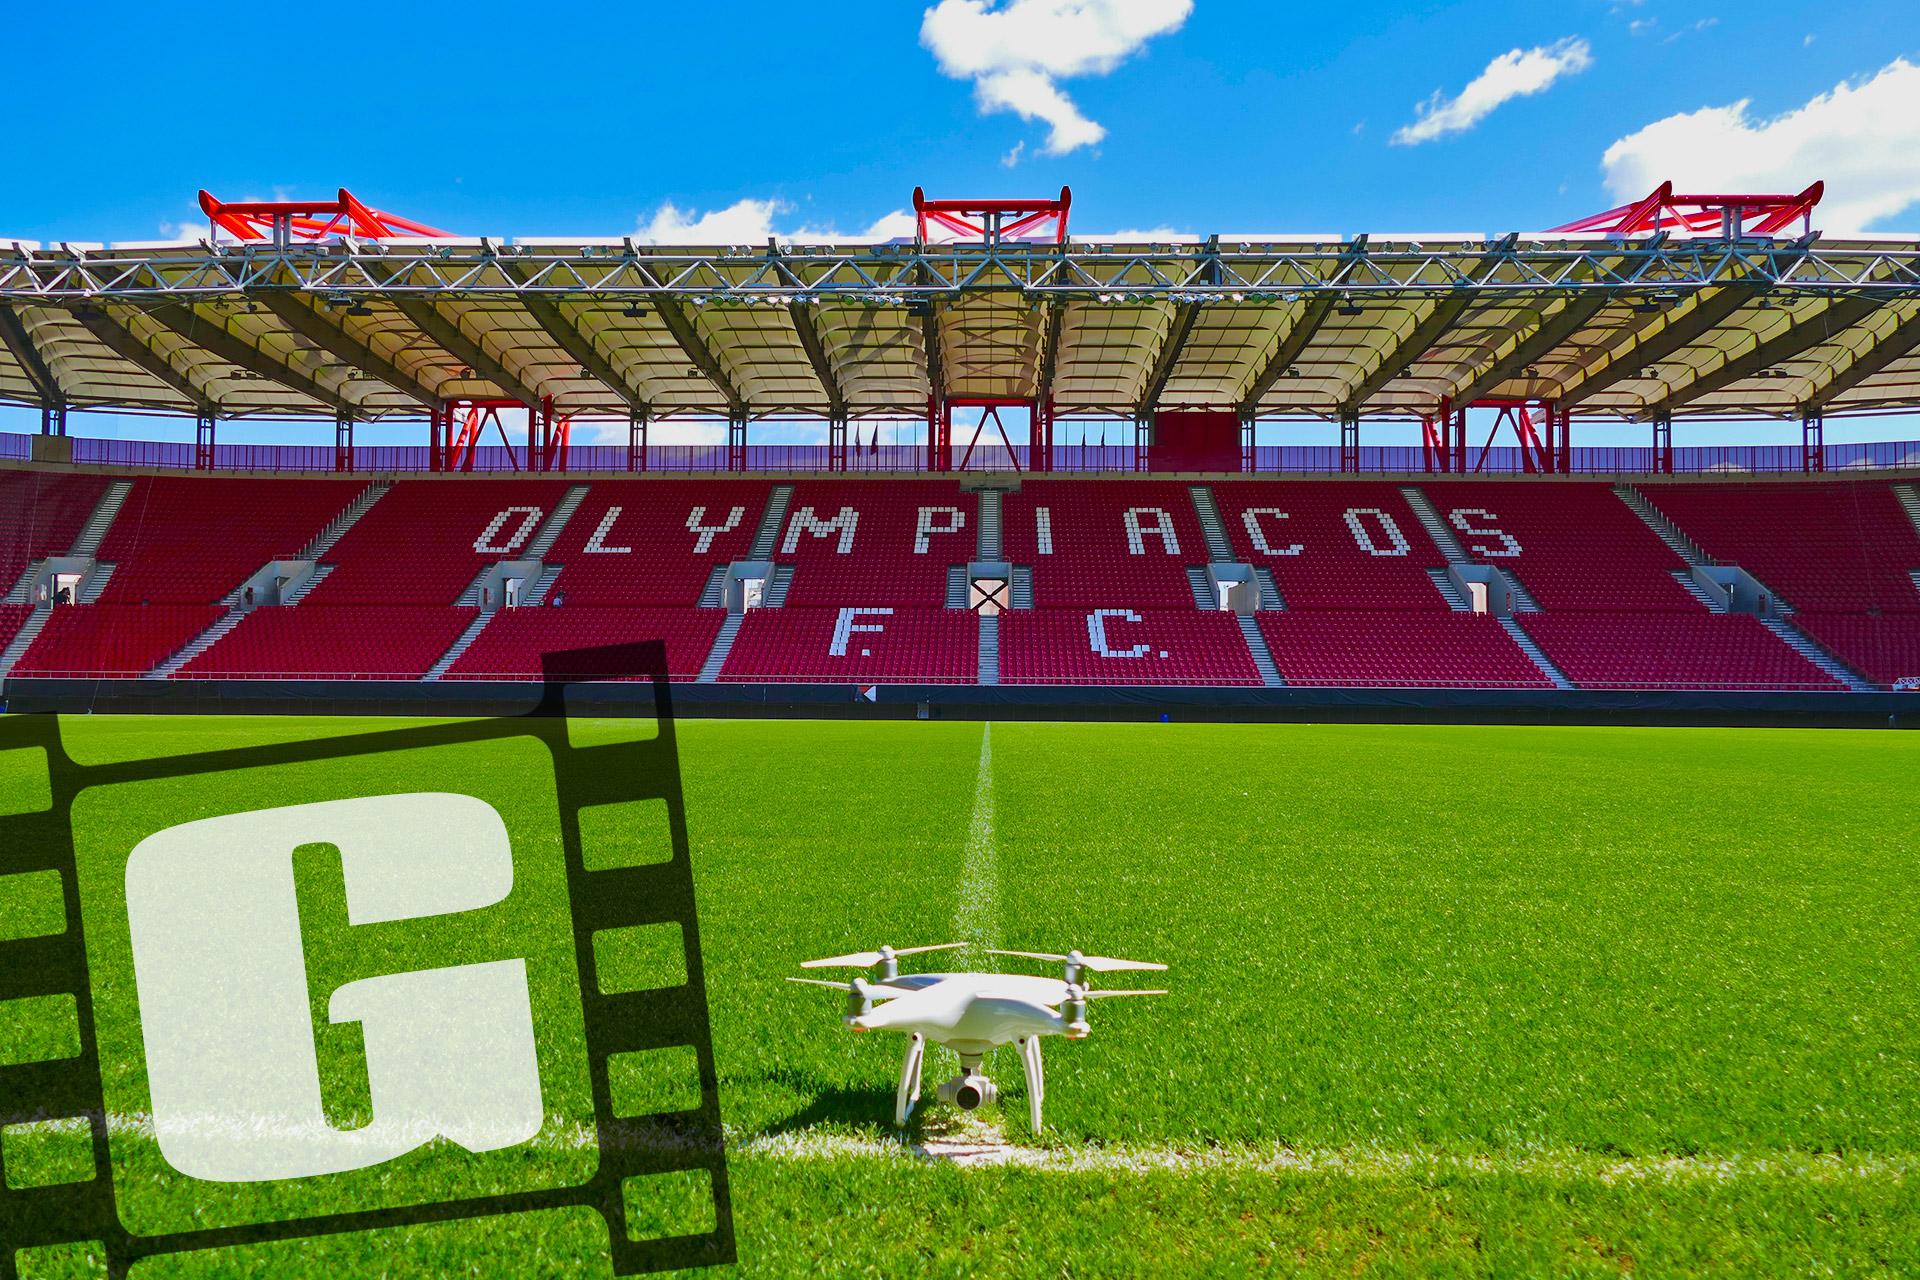 Karaiskakis Stadium Olympiacos F.C.